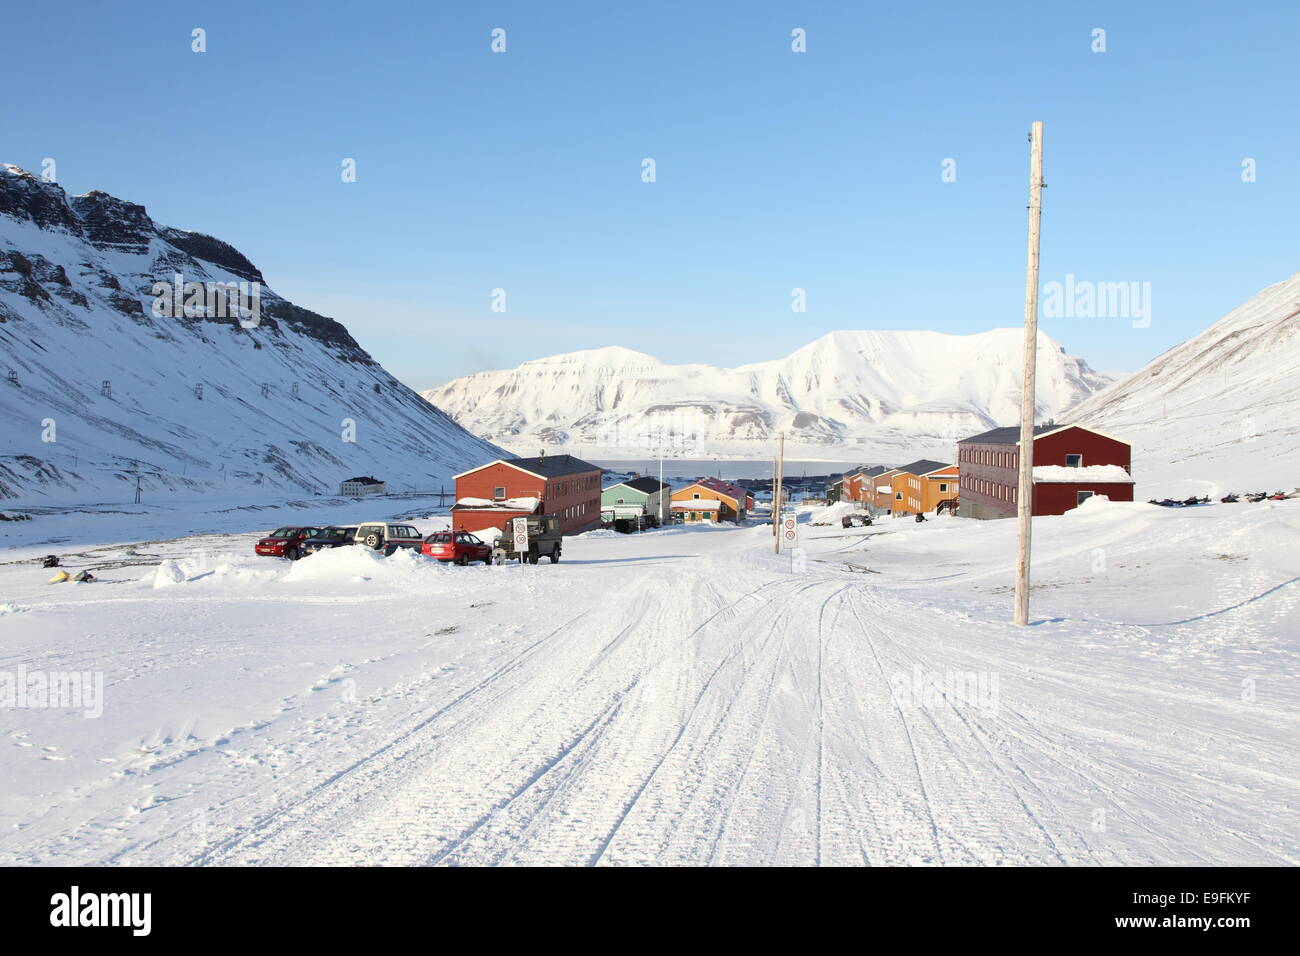 Longyearbyen, Svalbard - Stock Image